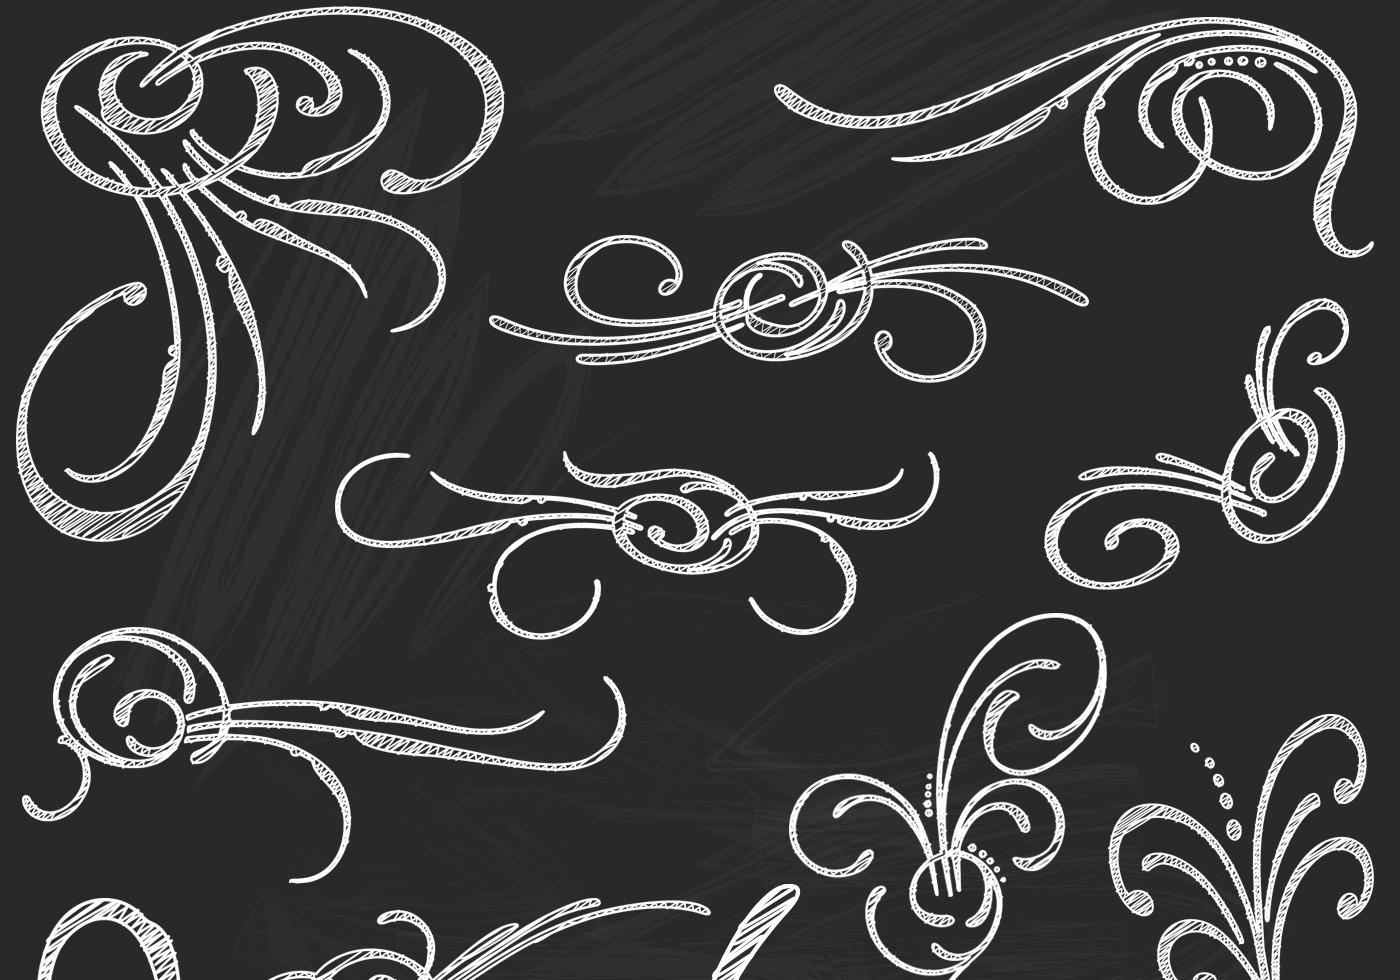 Chalk Drawn Flourish Elements Vector Pack Download Free